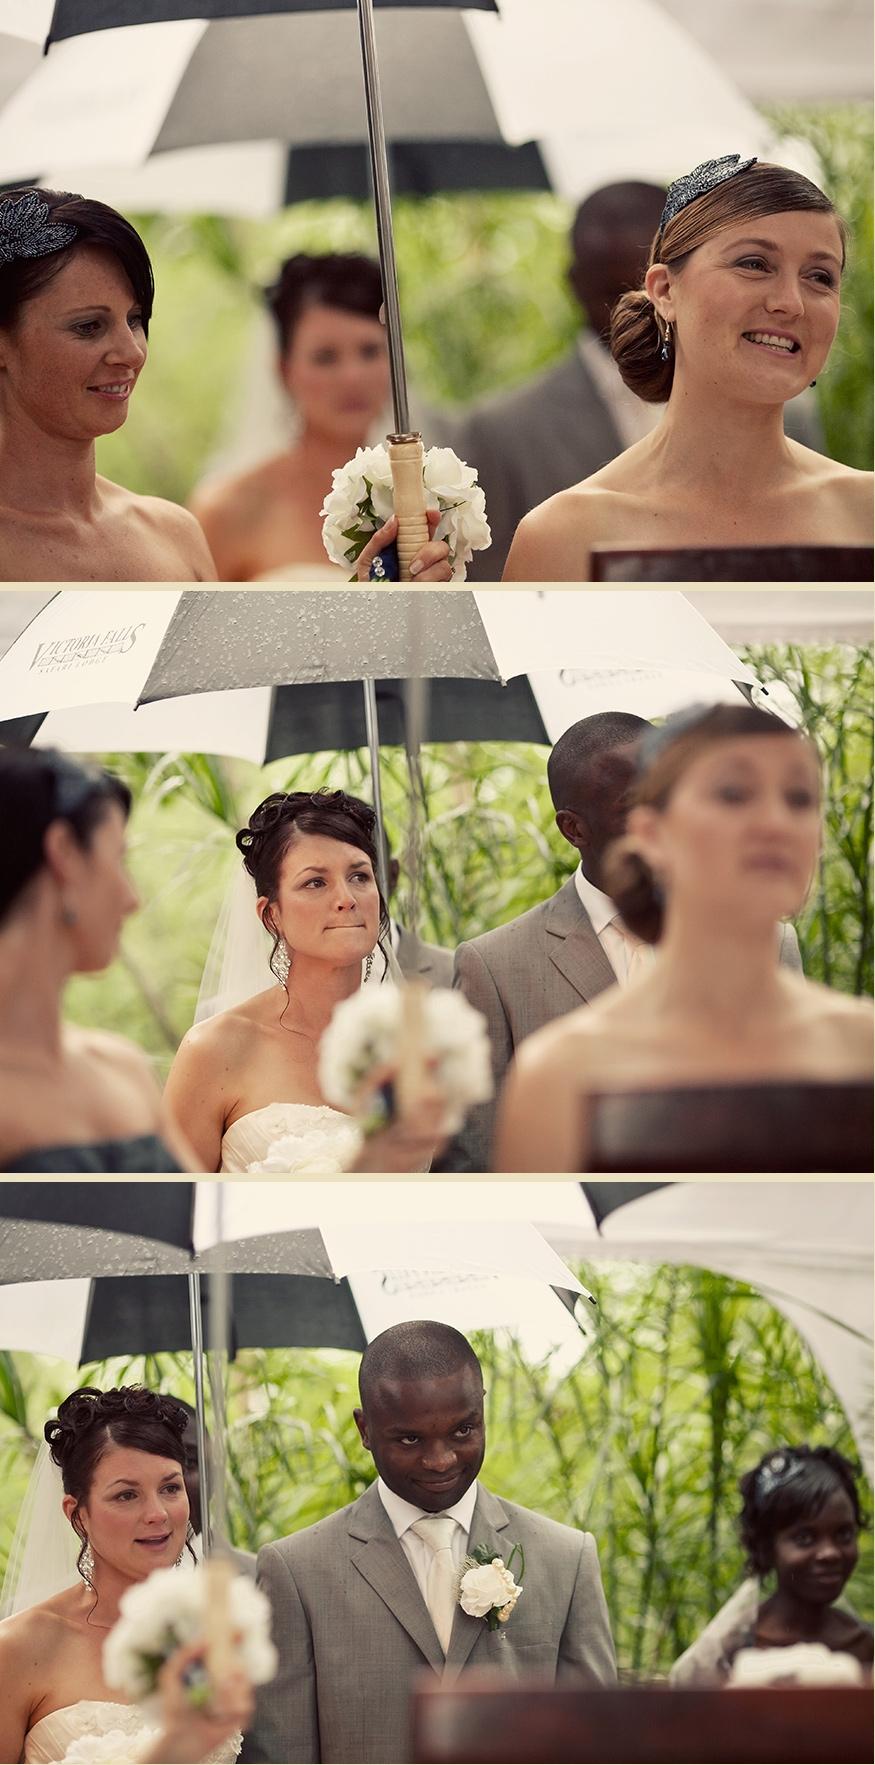 Brisbane Wedding Phoographer Blog-collage-1329184659537